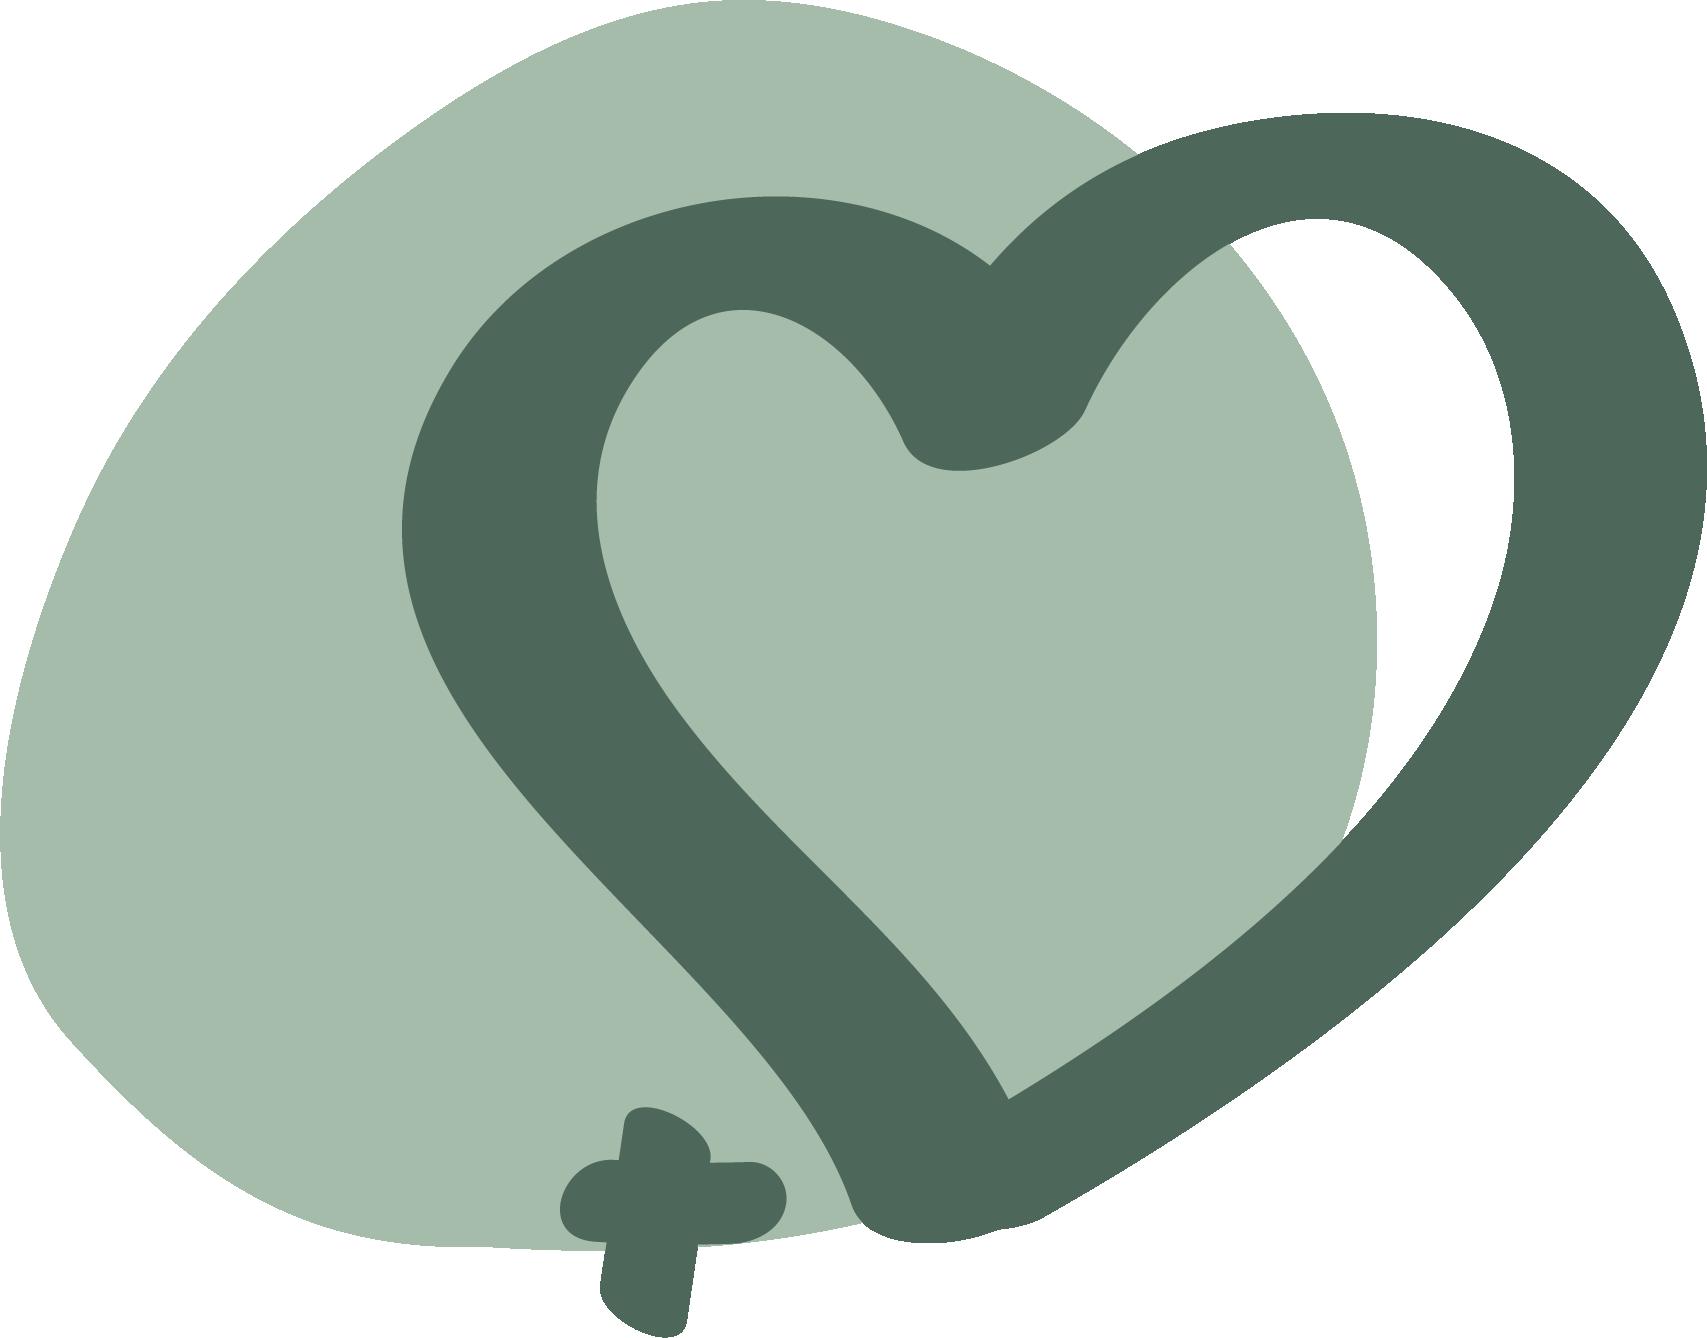 Icoon hart